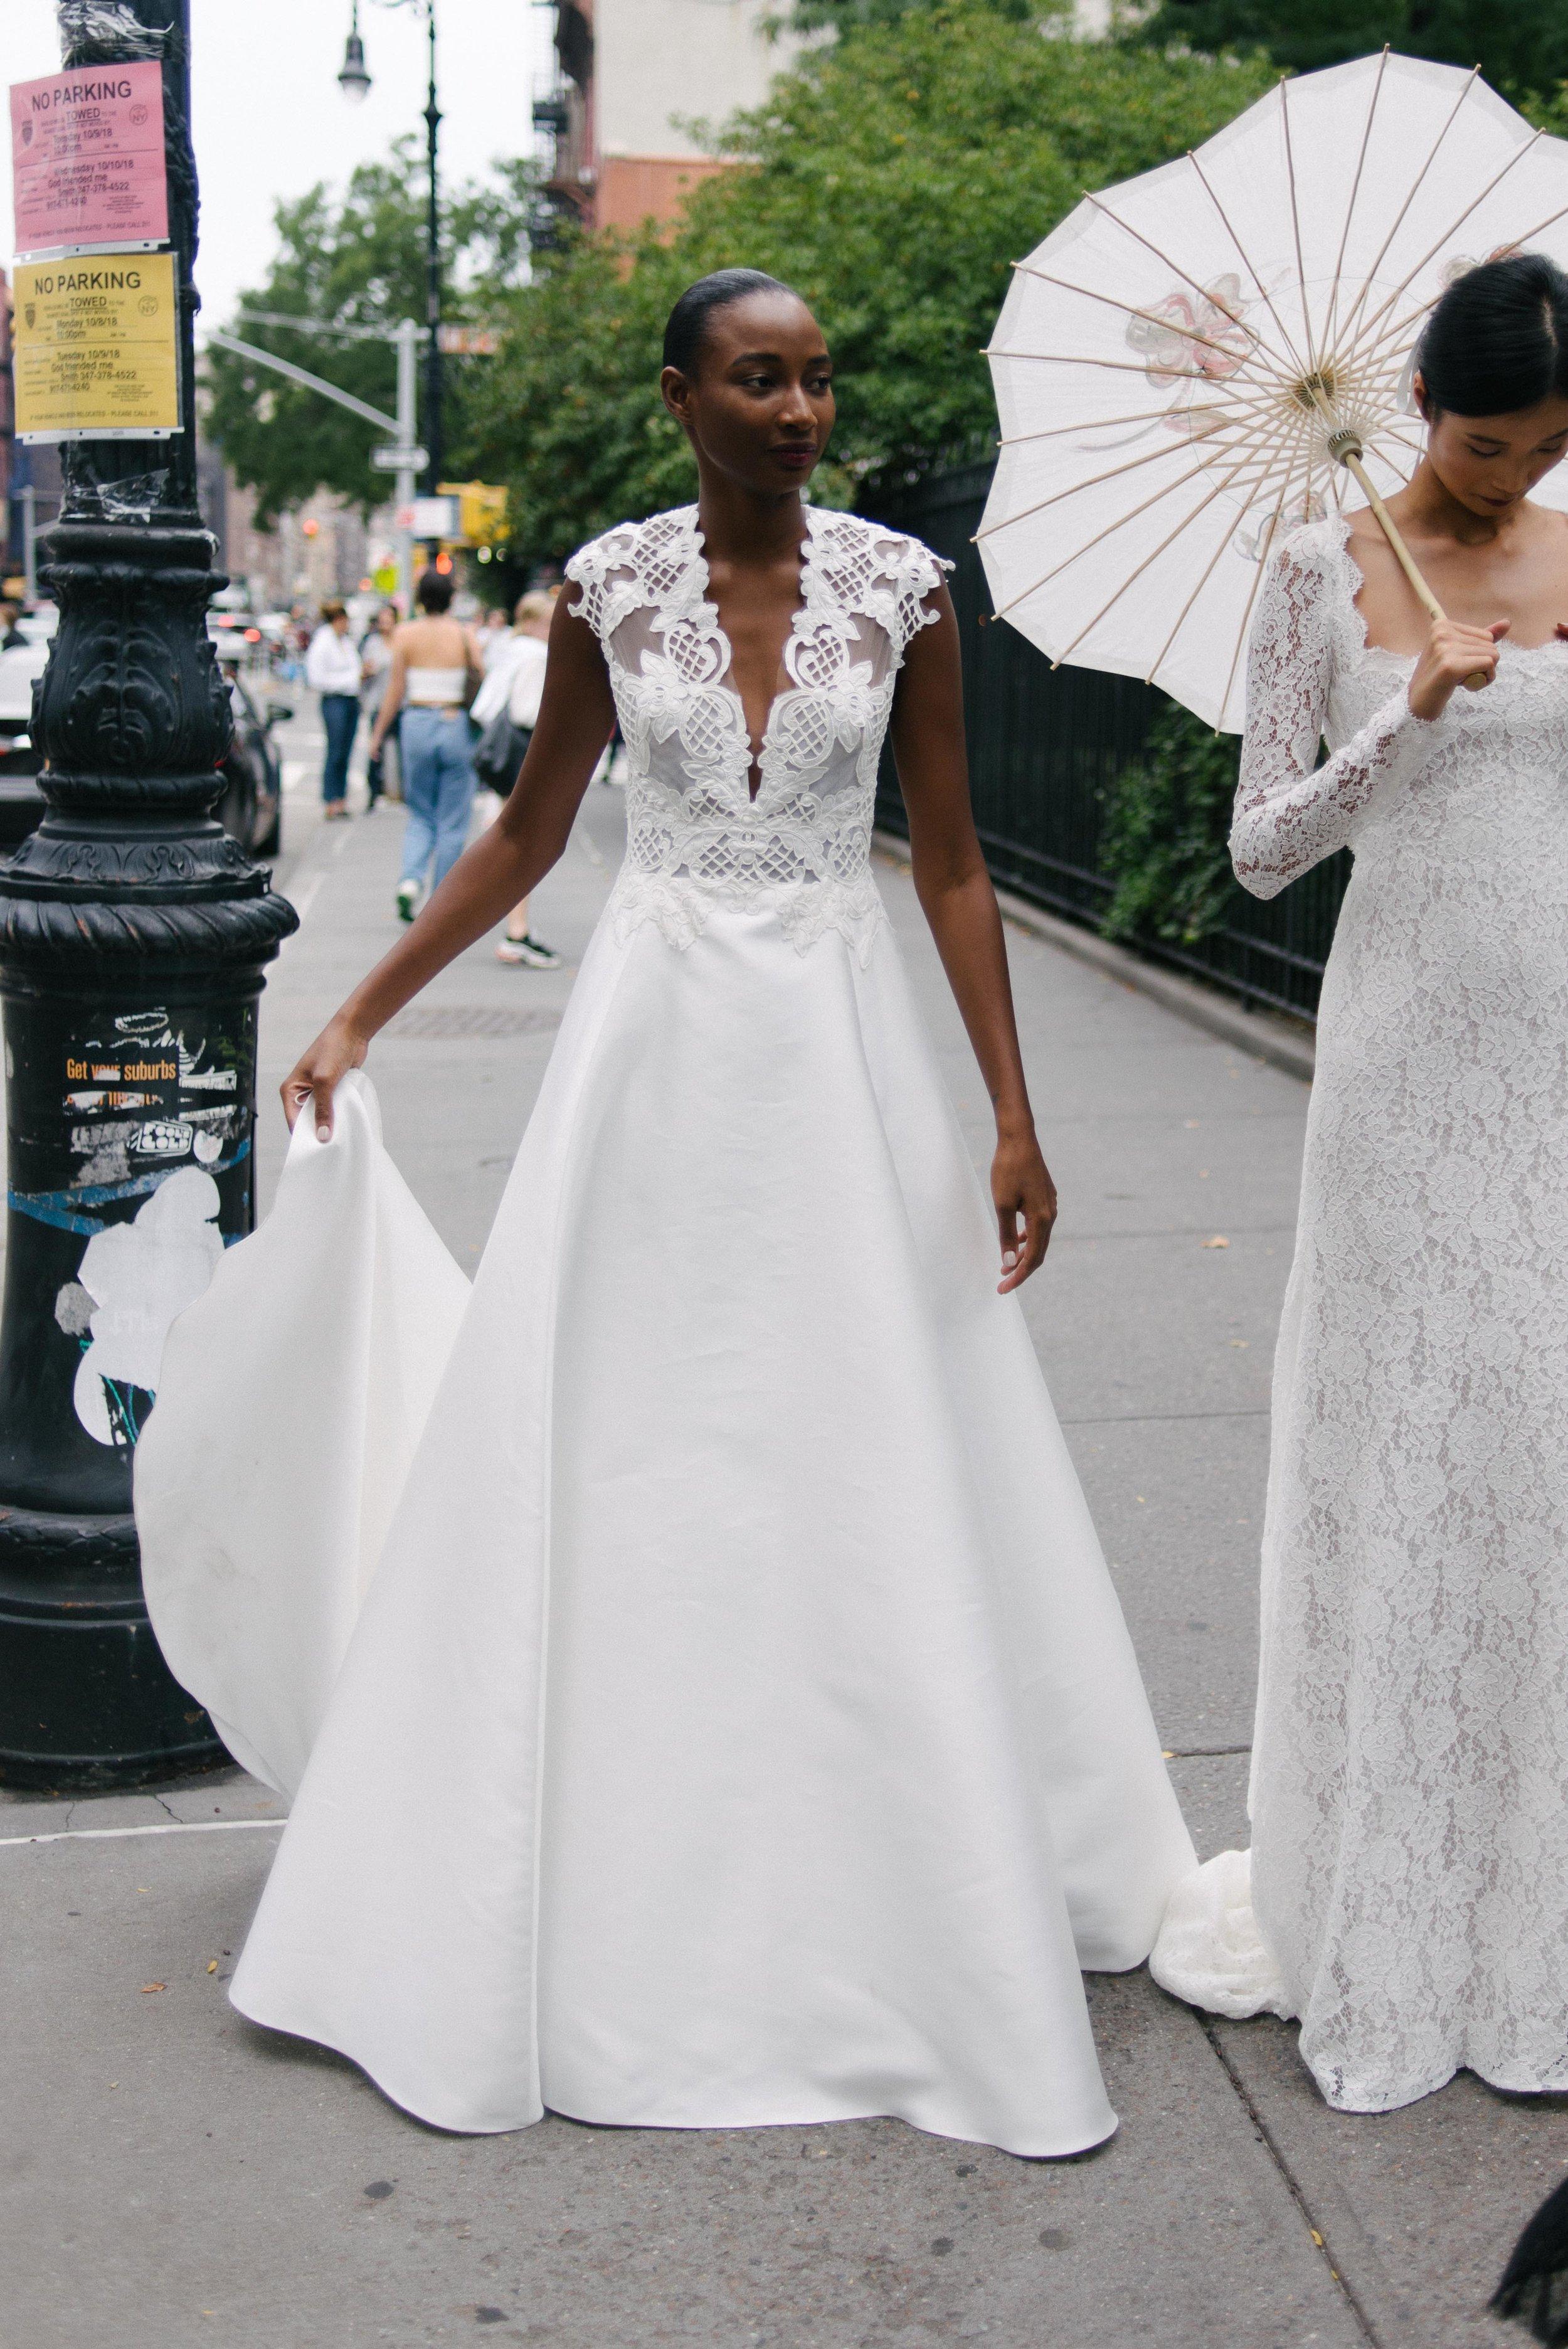 59e103419bb Lela Rose s Bridal Garden Party — Little White Dress Bridal Shop ...